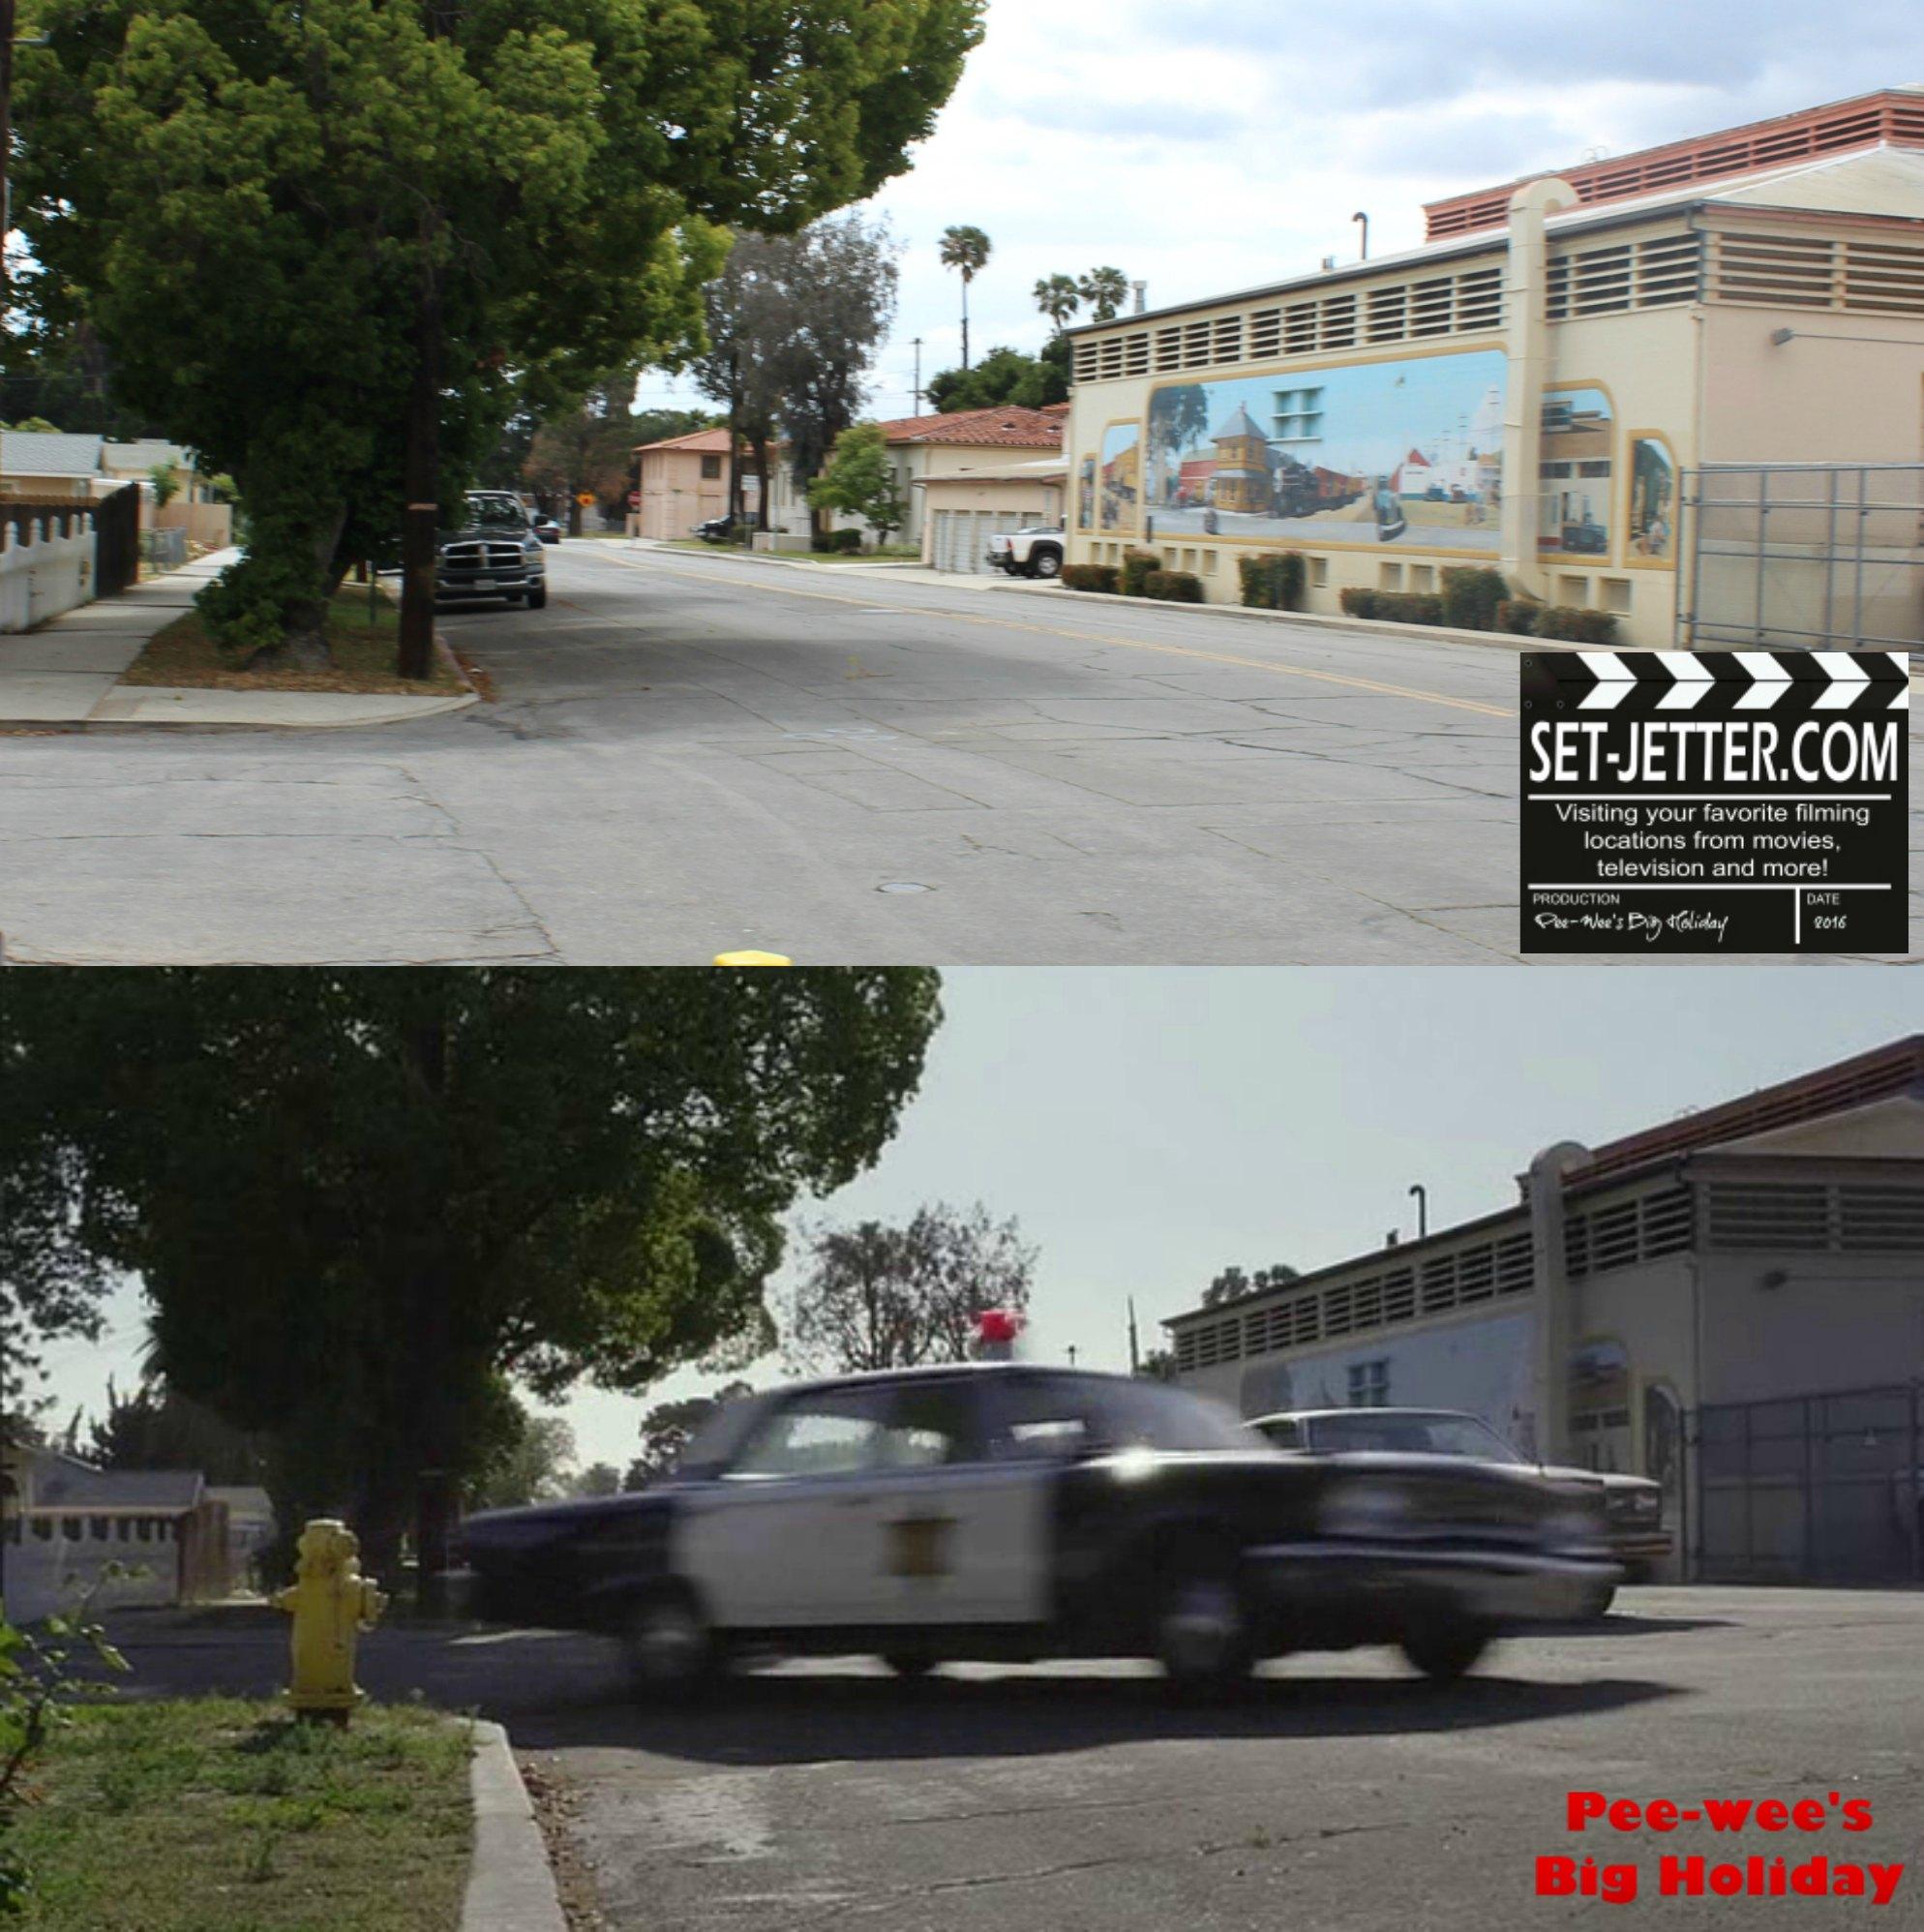 Pee Wee's Big Holiday comparison 361.jpg